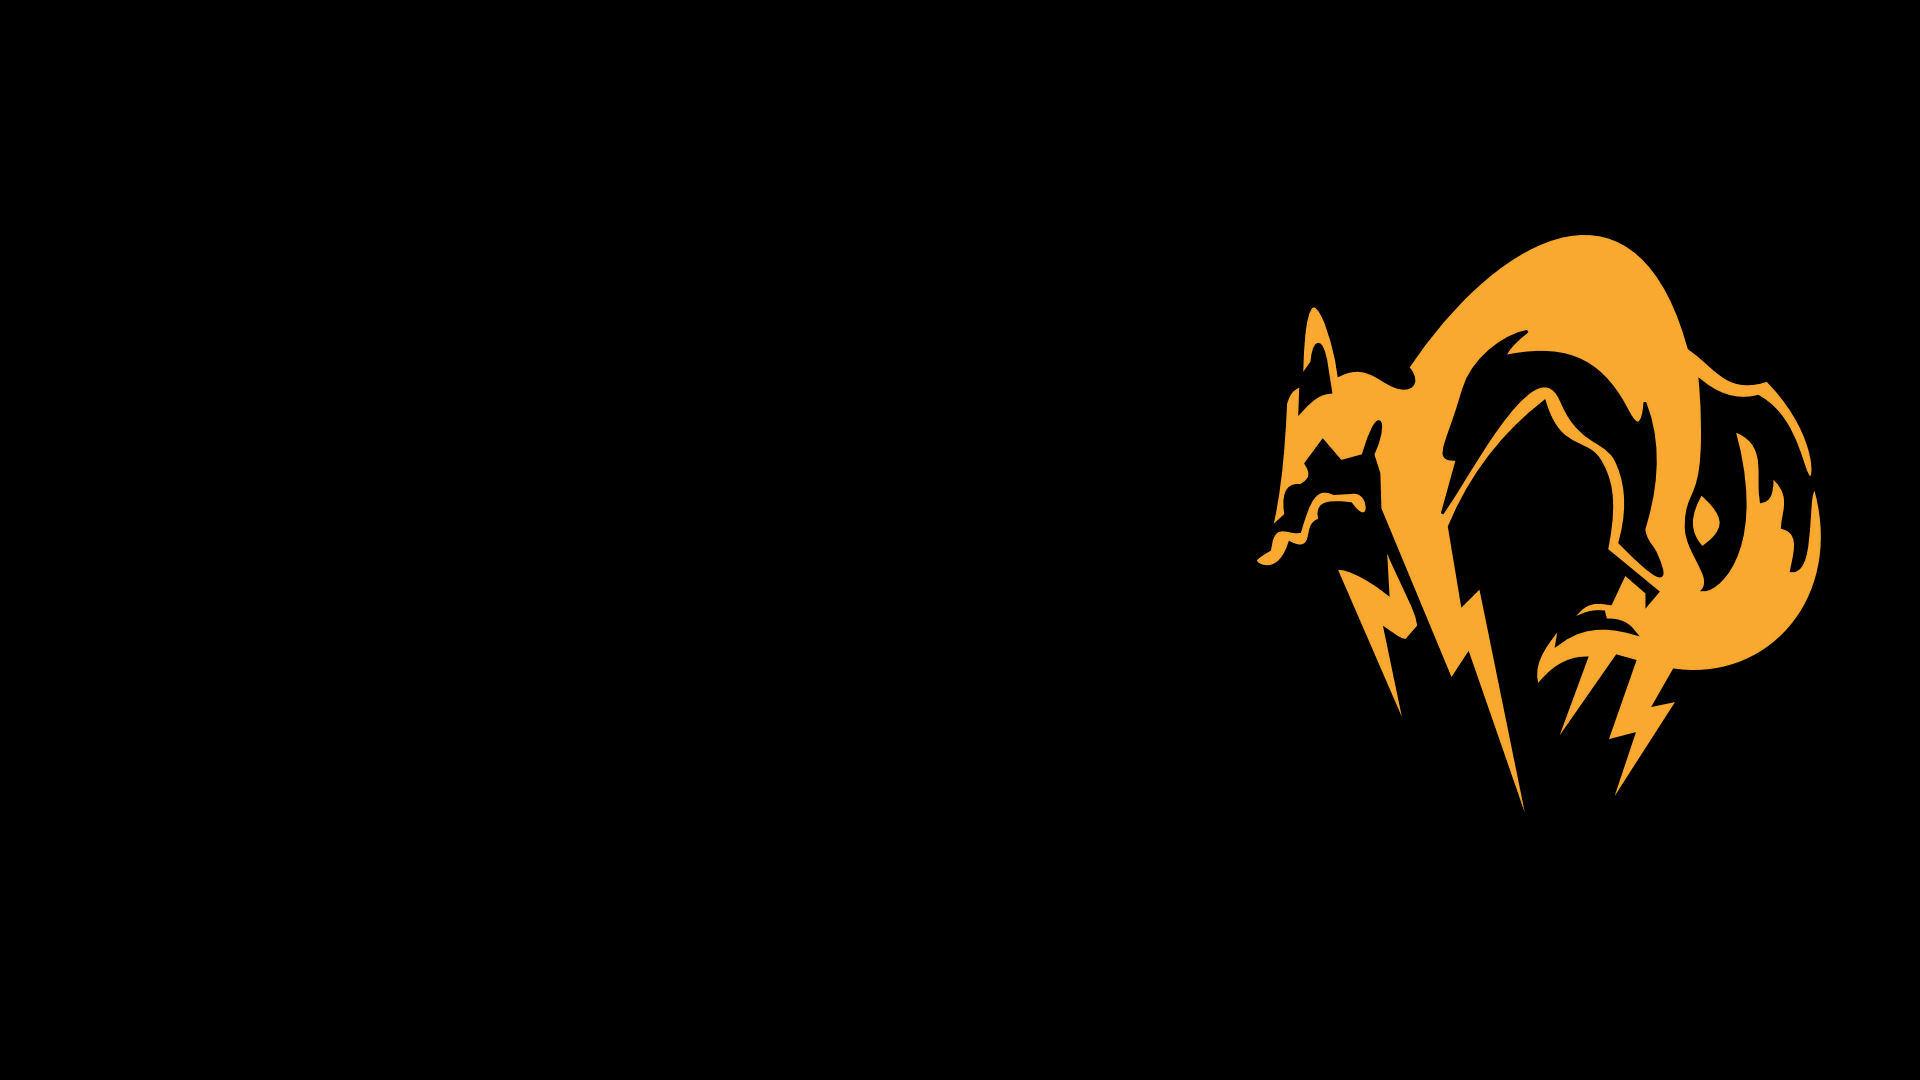 foxhound wallpaper - wallpapersafari